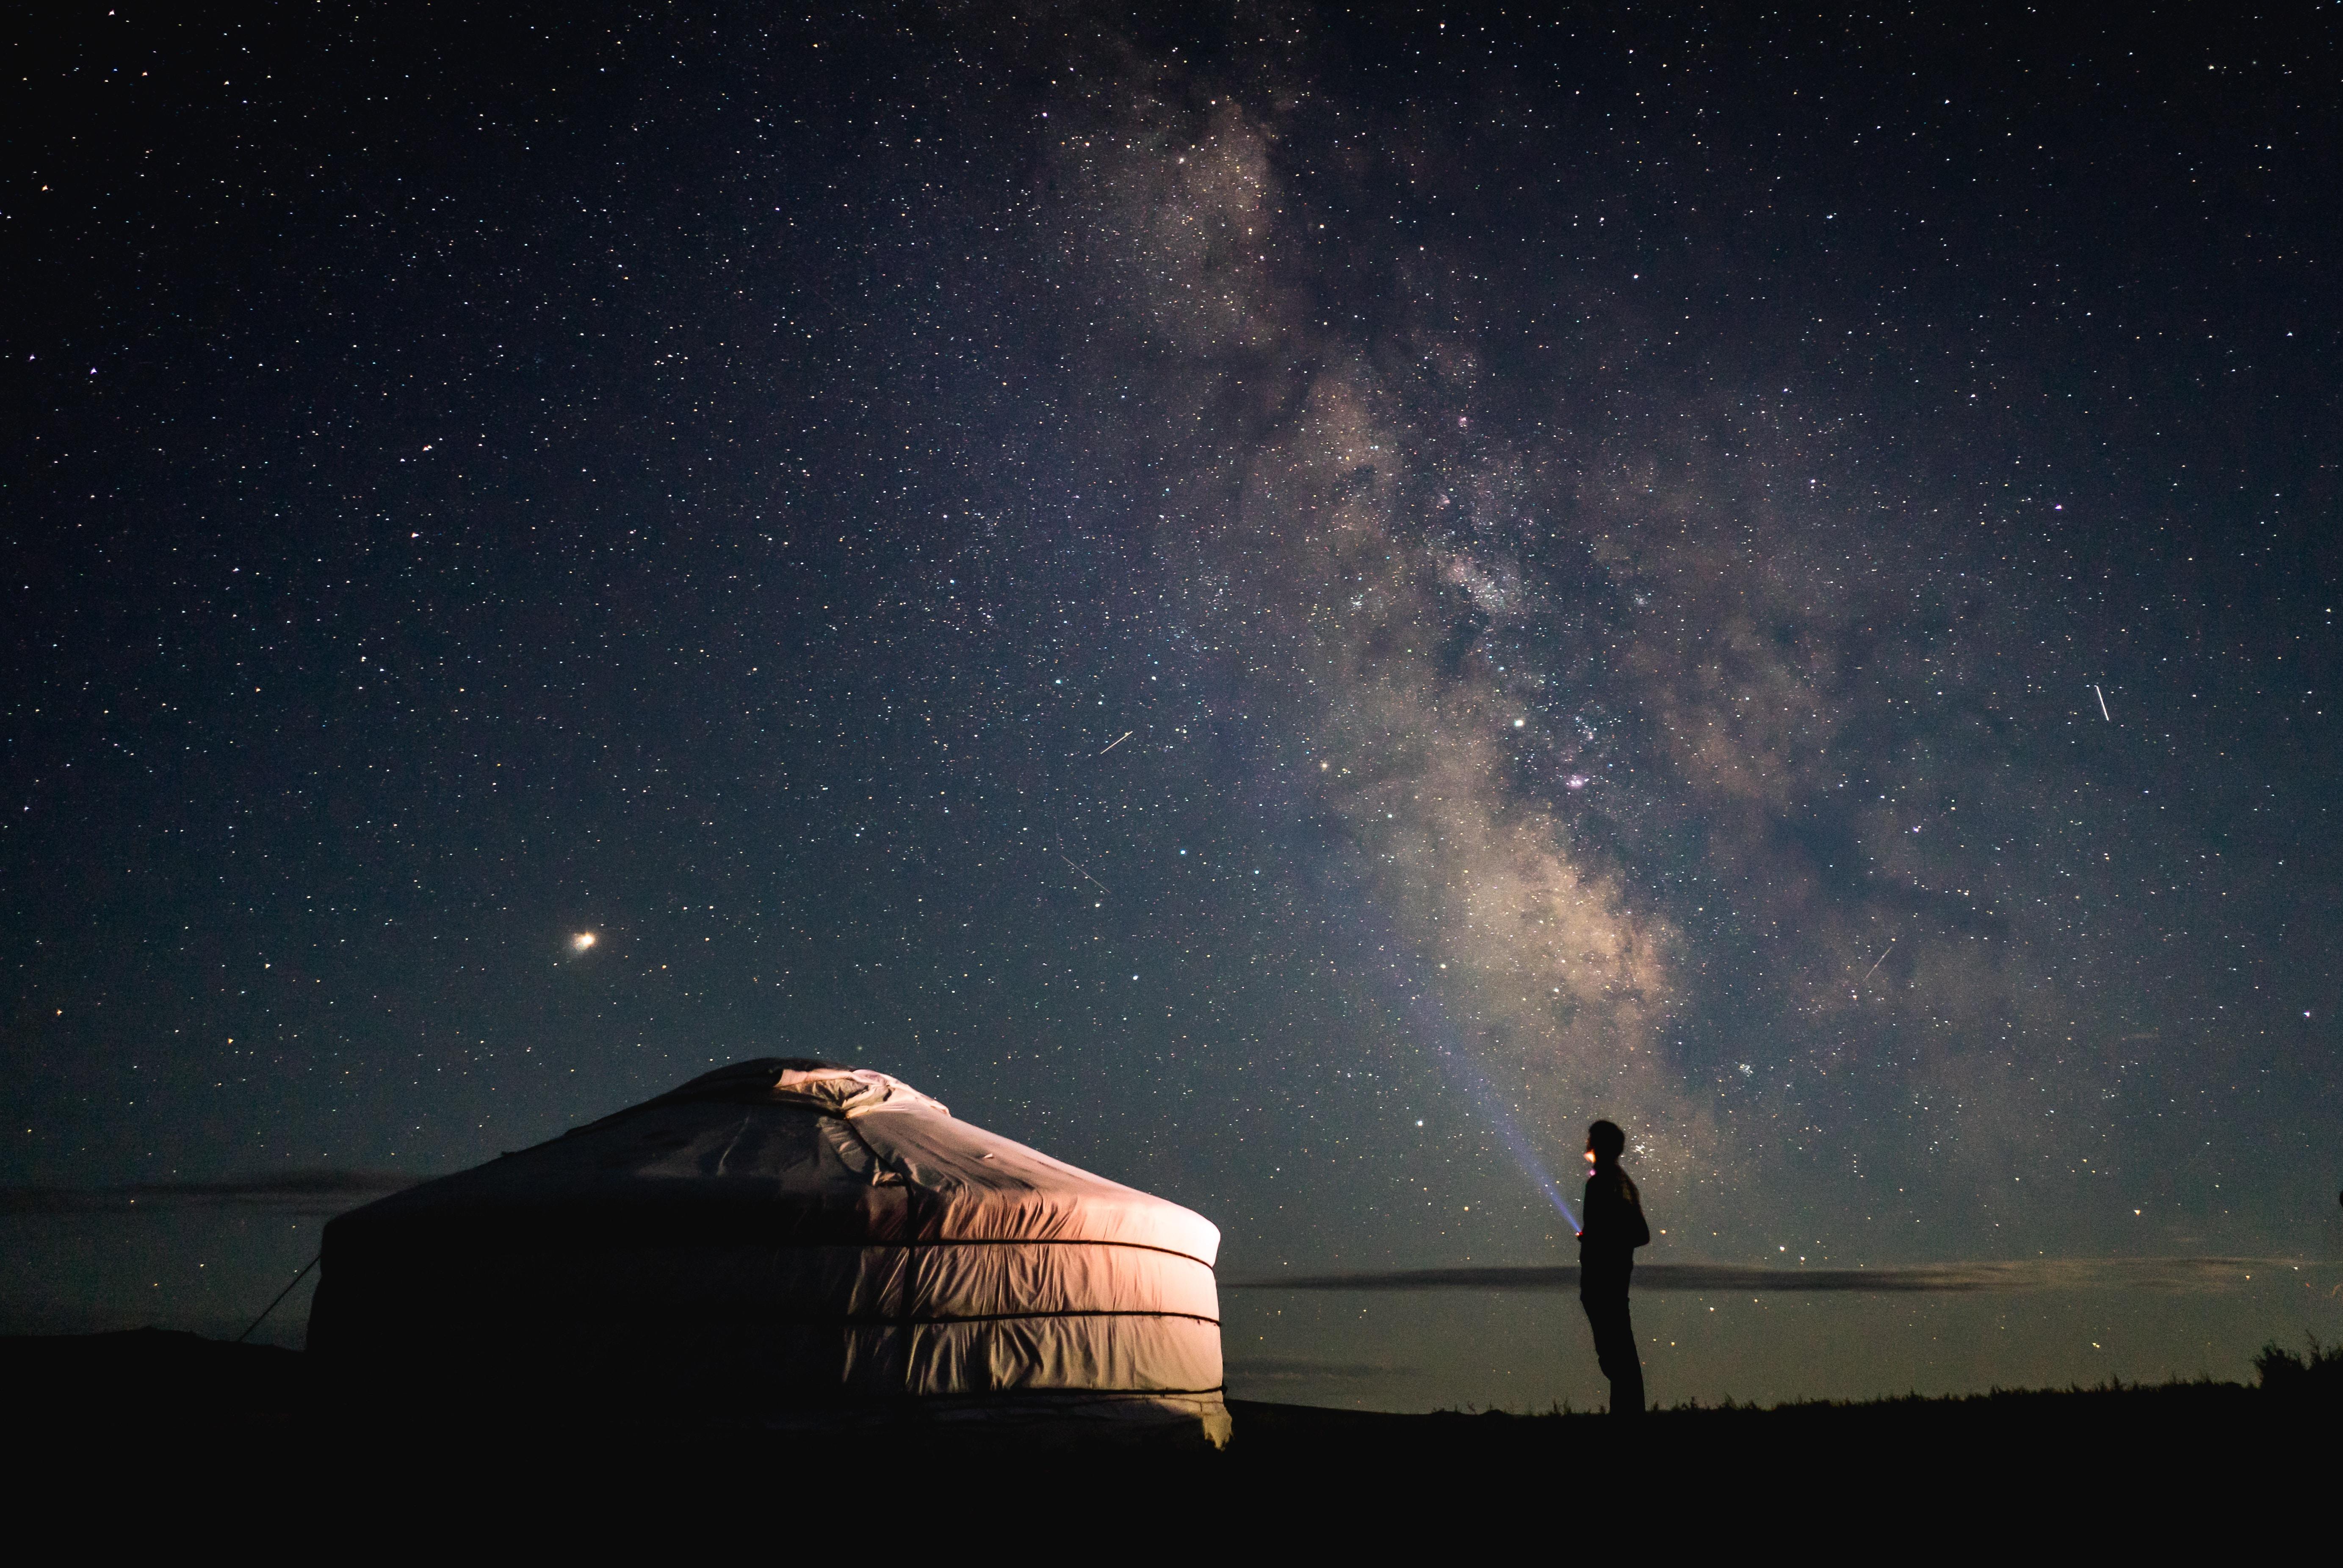 Beyond Earth | Photo by Patrick Schneider from Unsplash.com